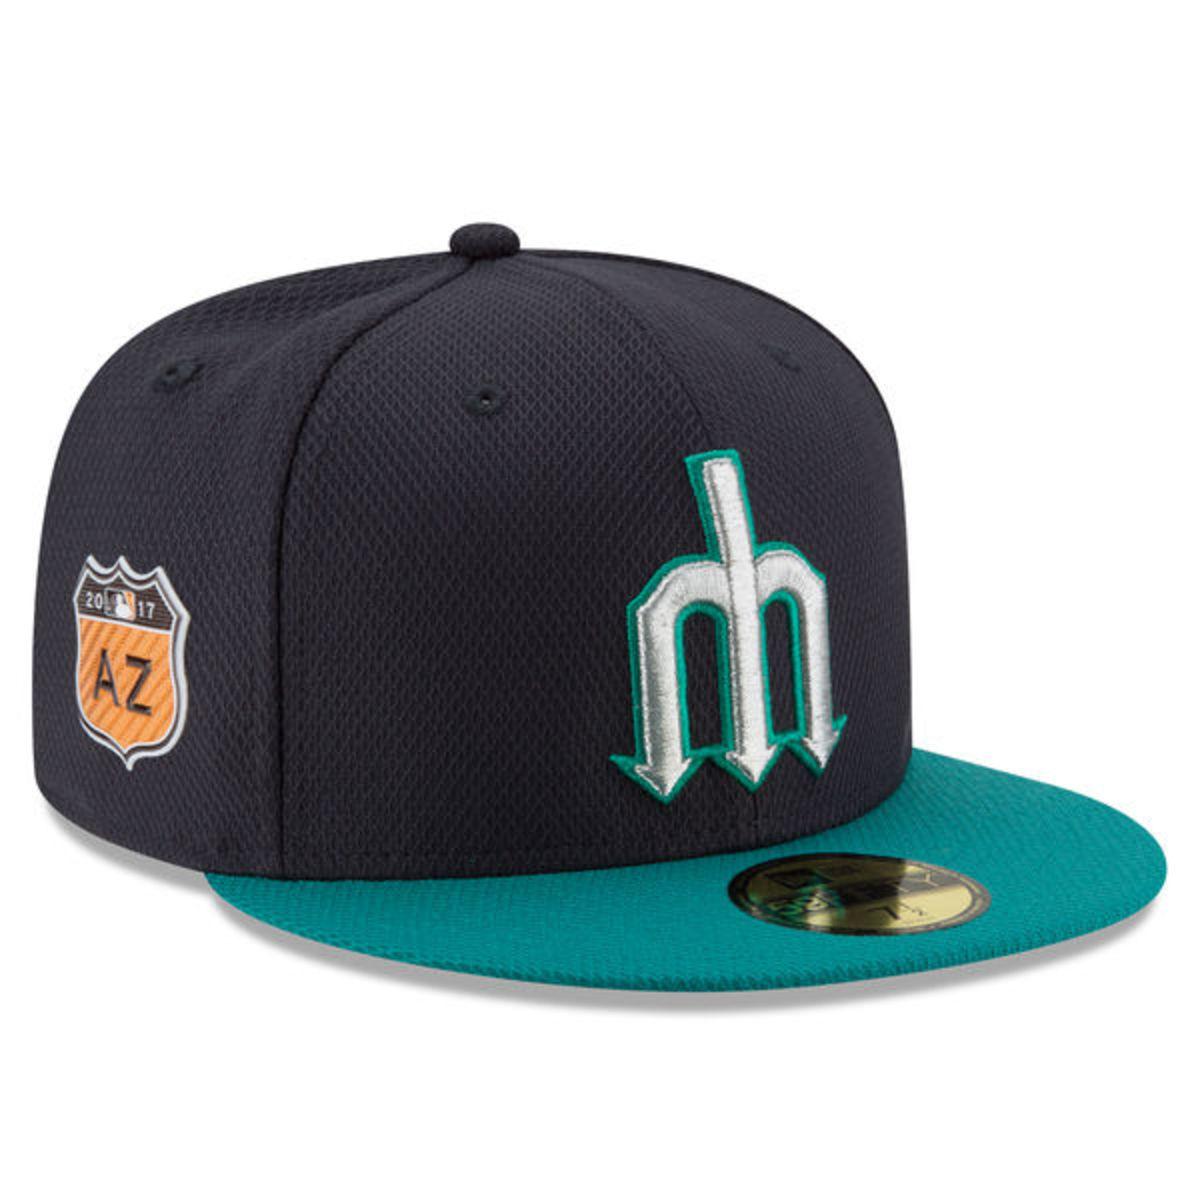 mariners-spring-training-hat.jpg